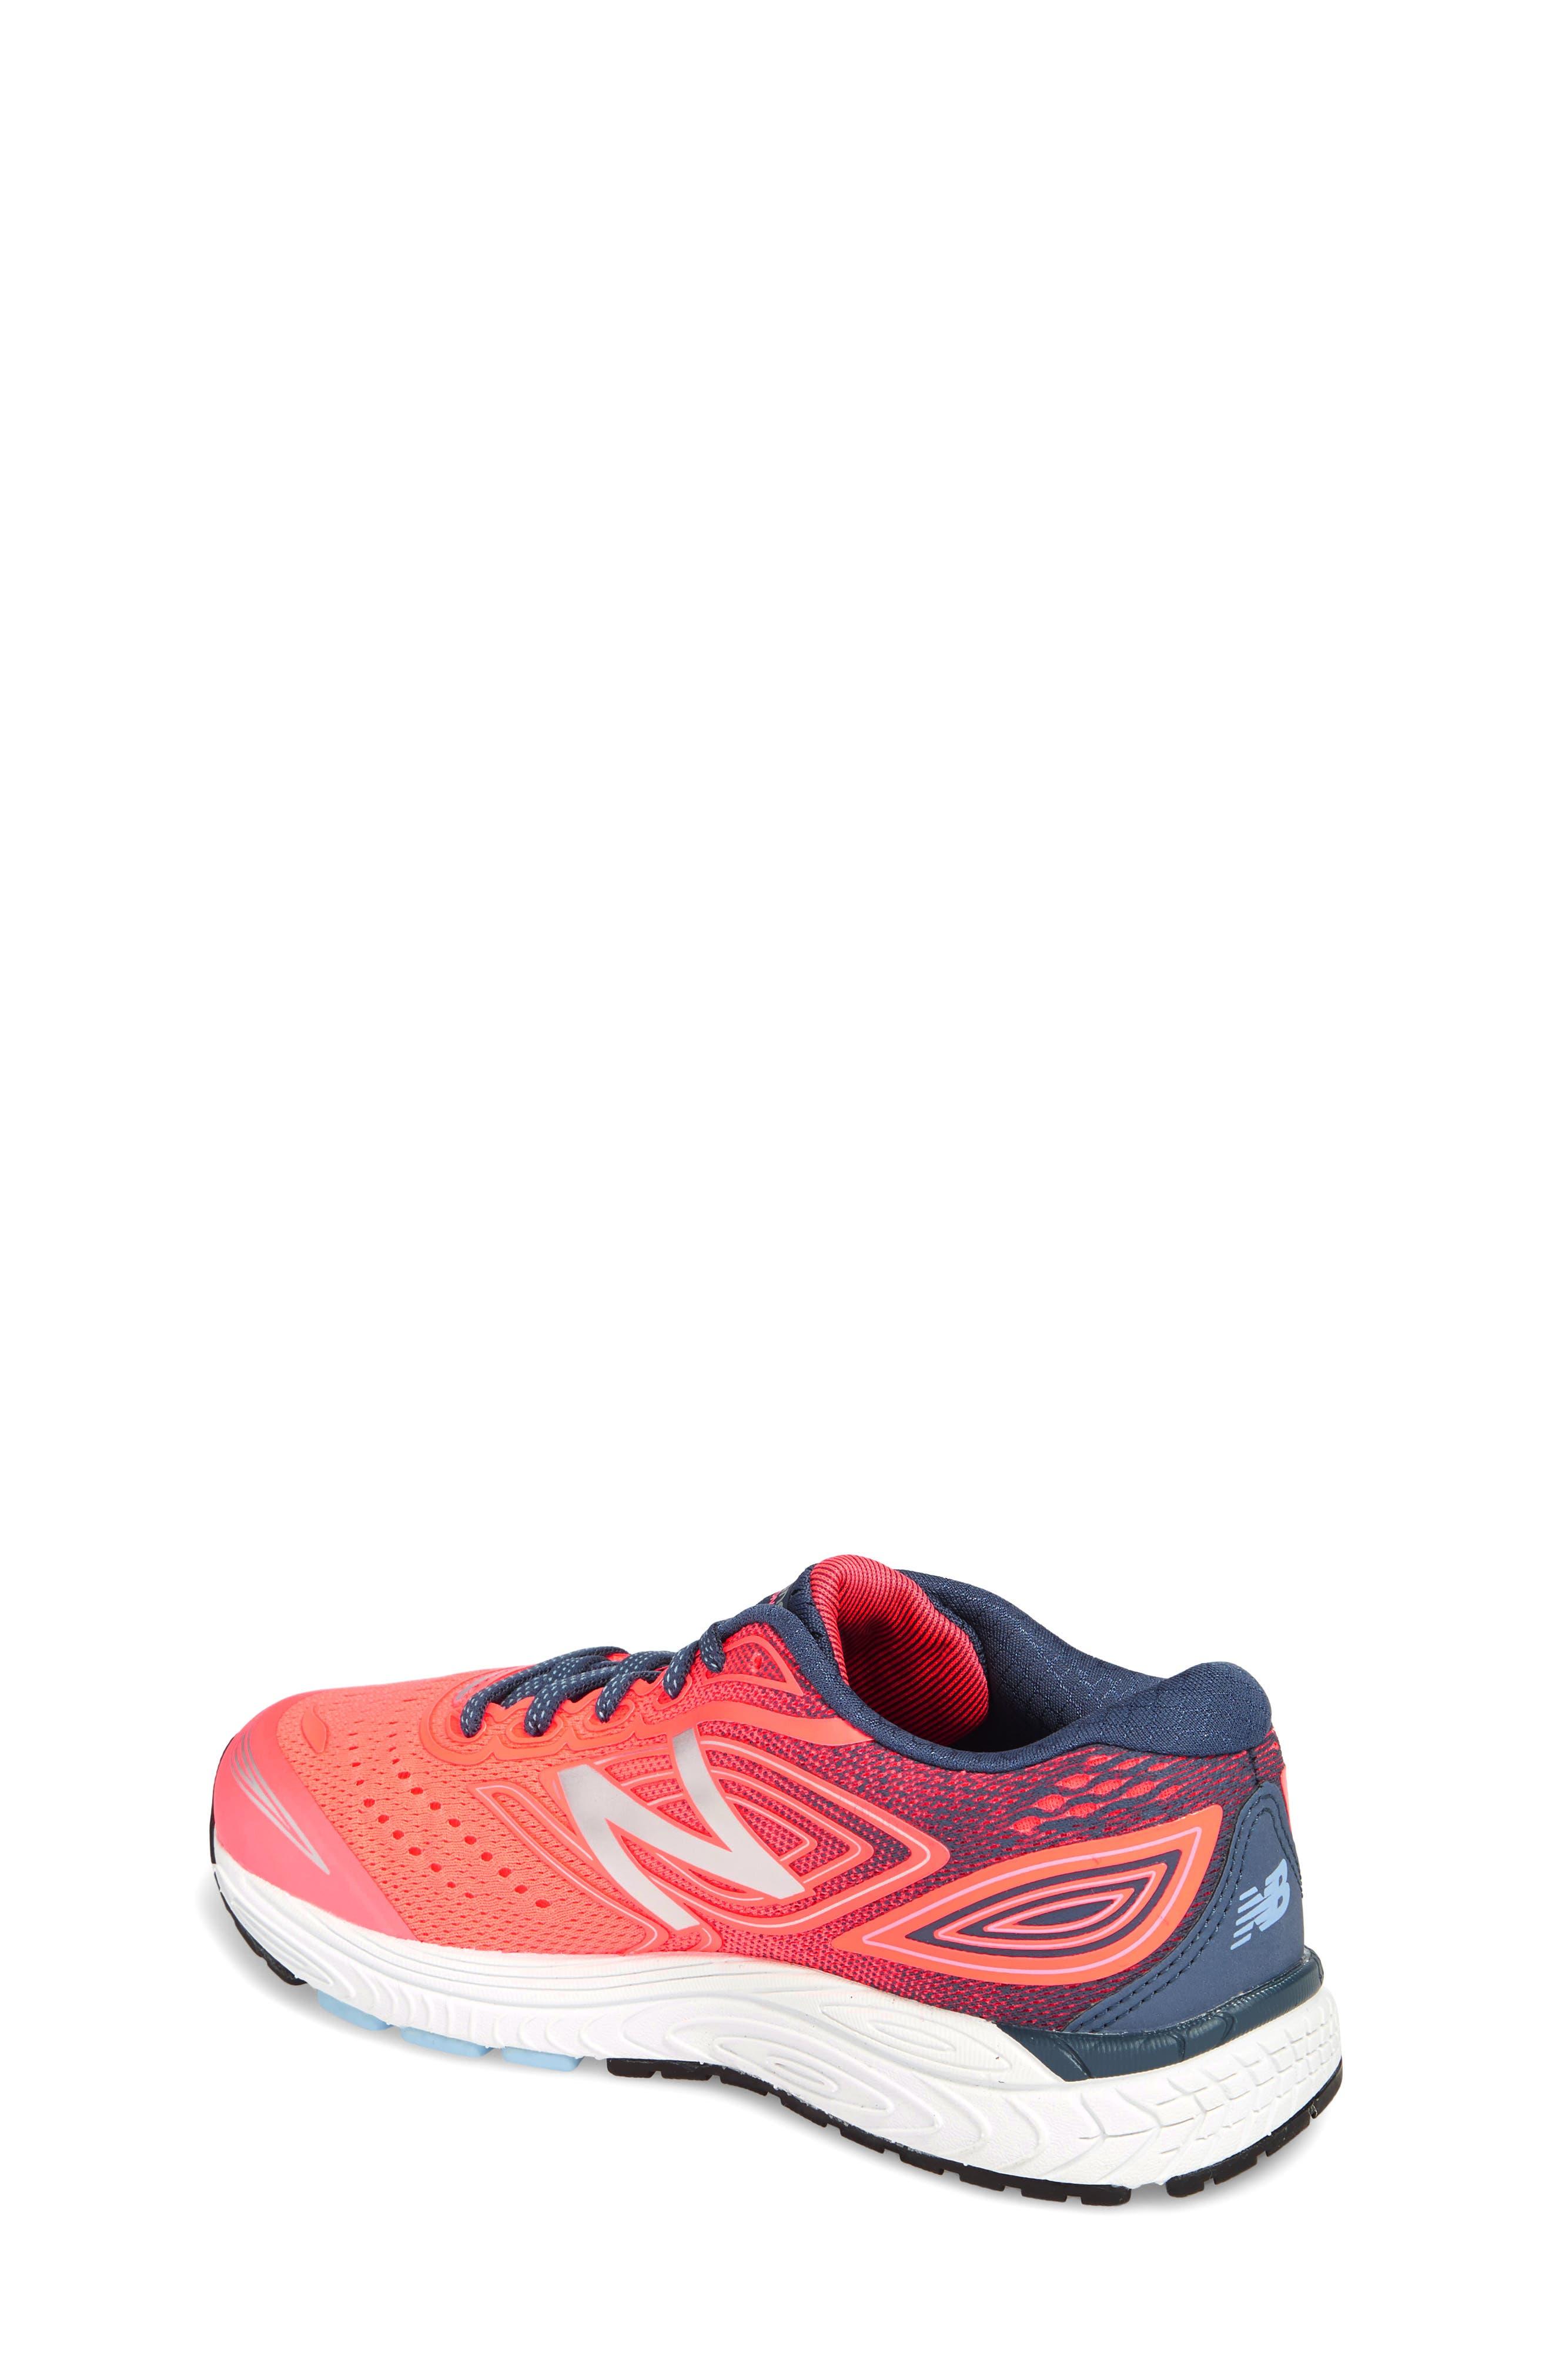 880v7 Sneaker,                             Alternate thumbnail 2, color,                             Guava